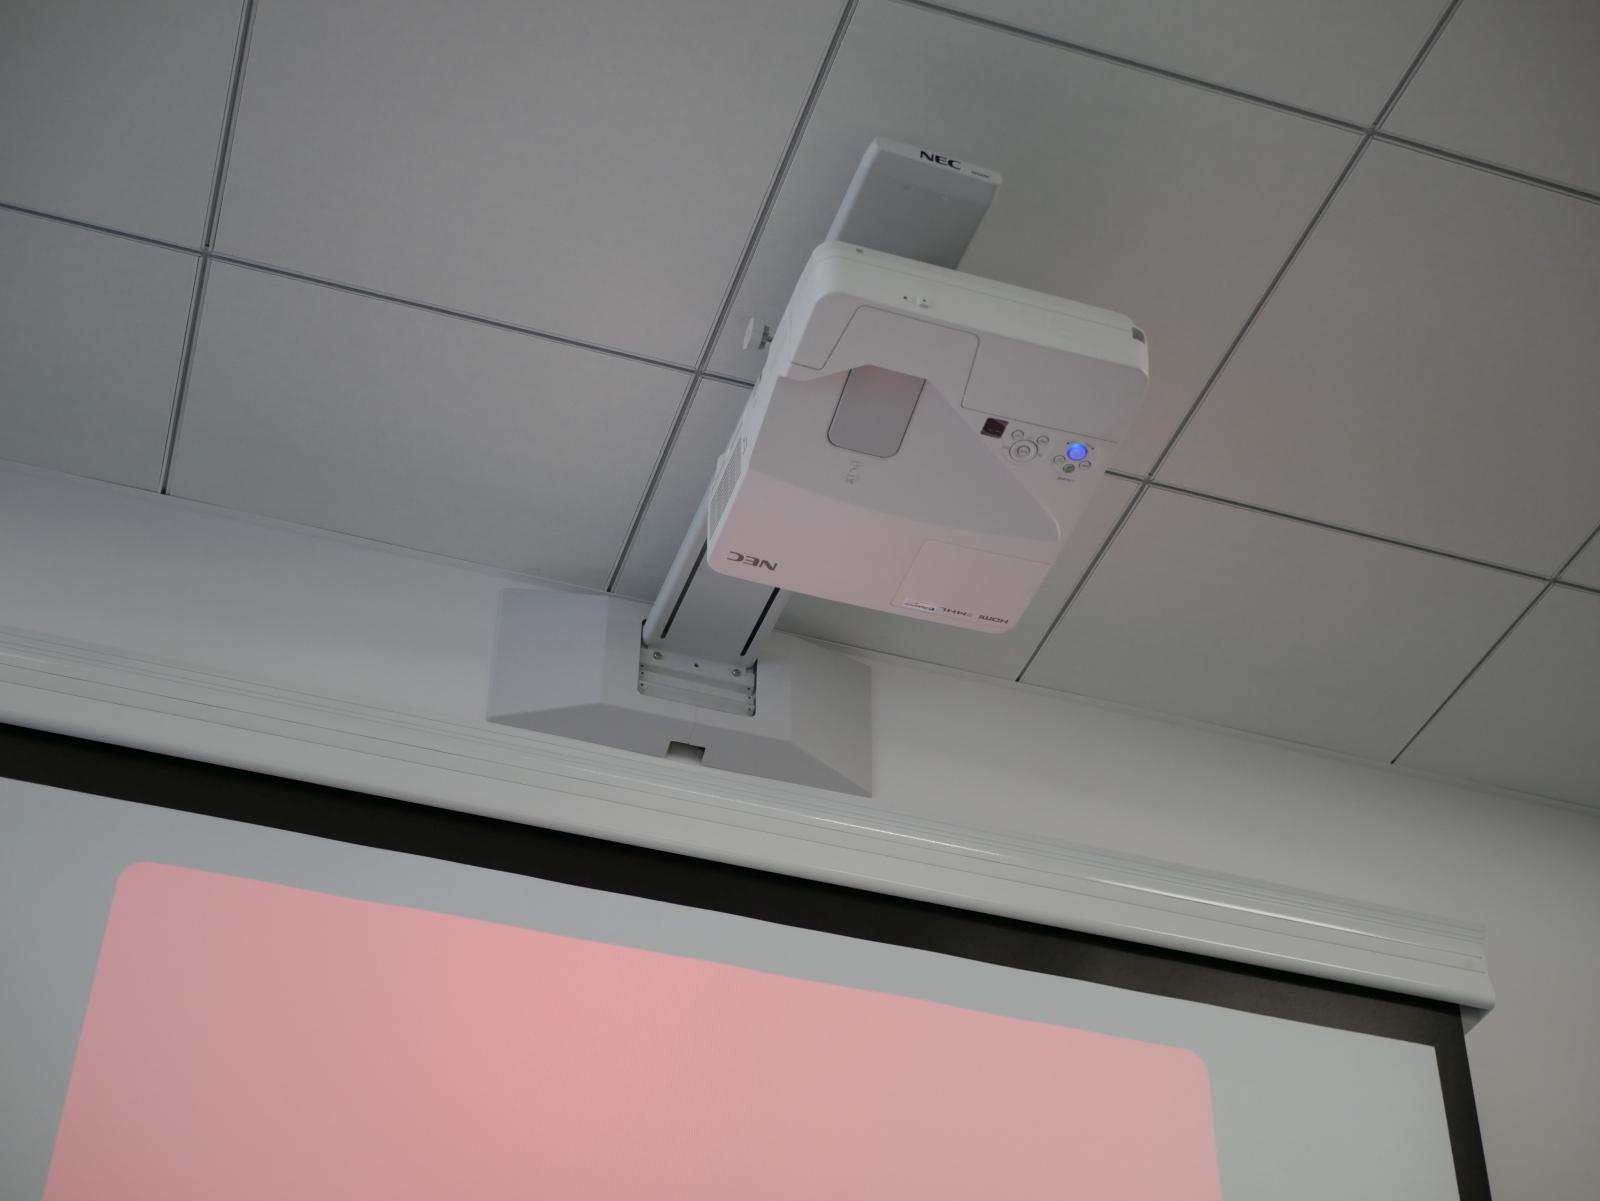 P1080026